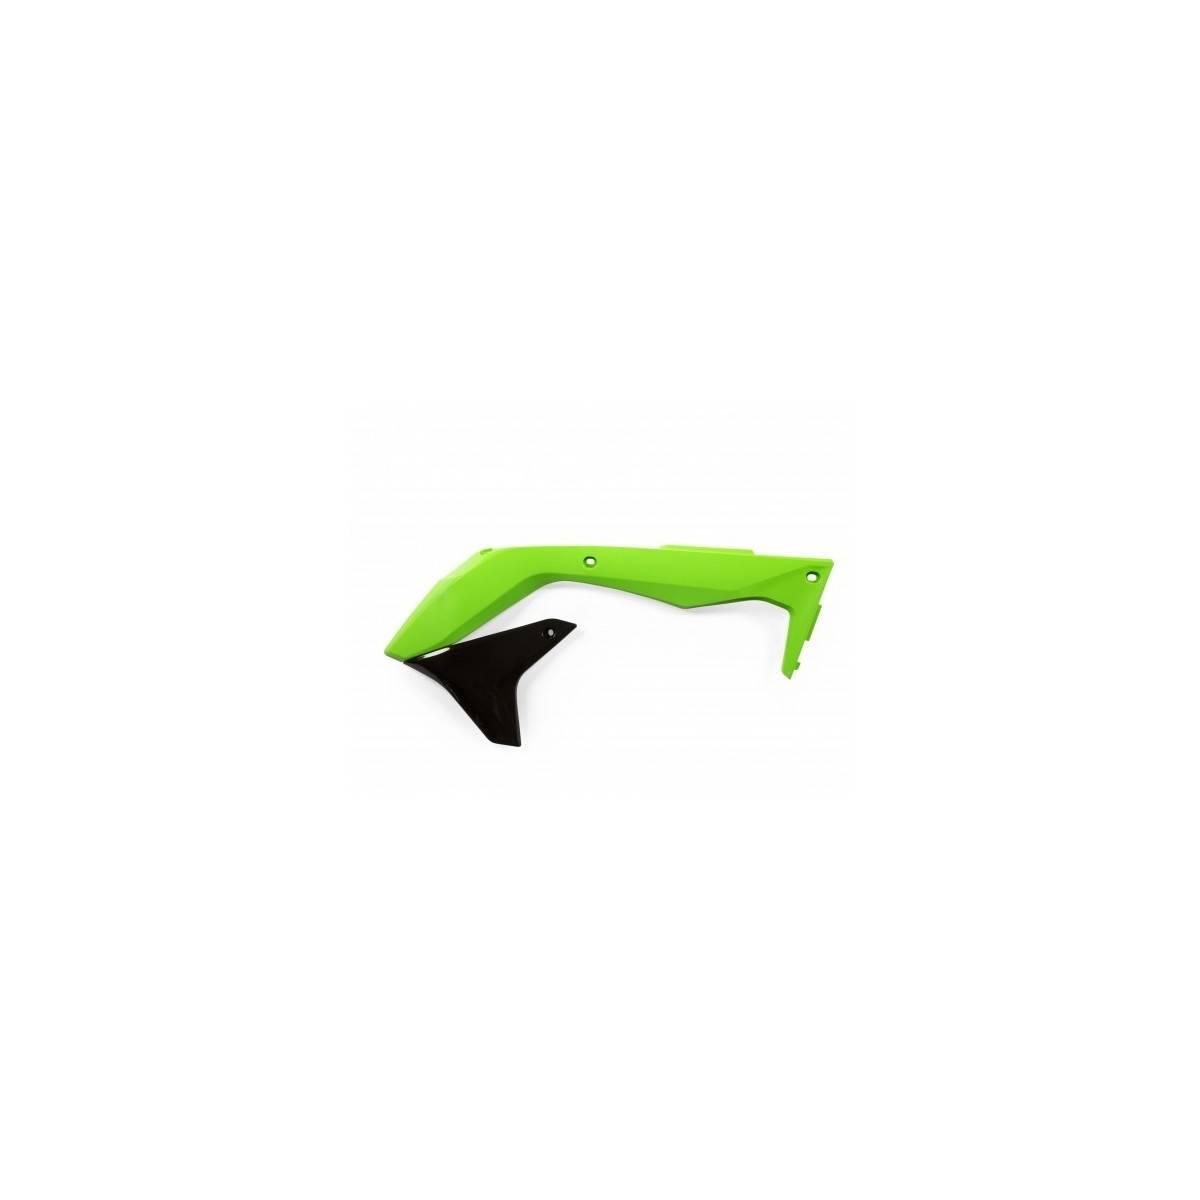 0021837-377 - Tapa Radiador Kx-F 450 16 18 Verde Negro